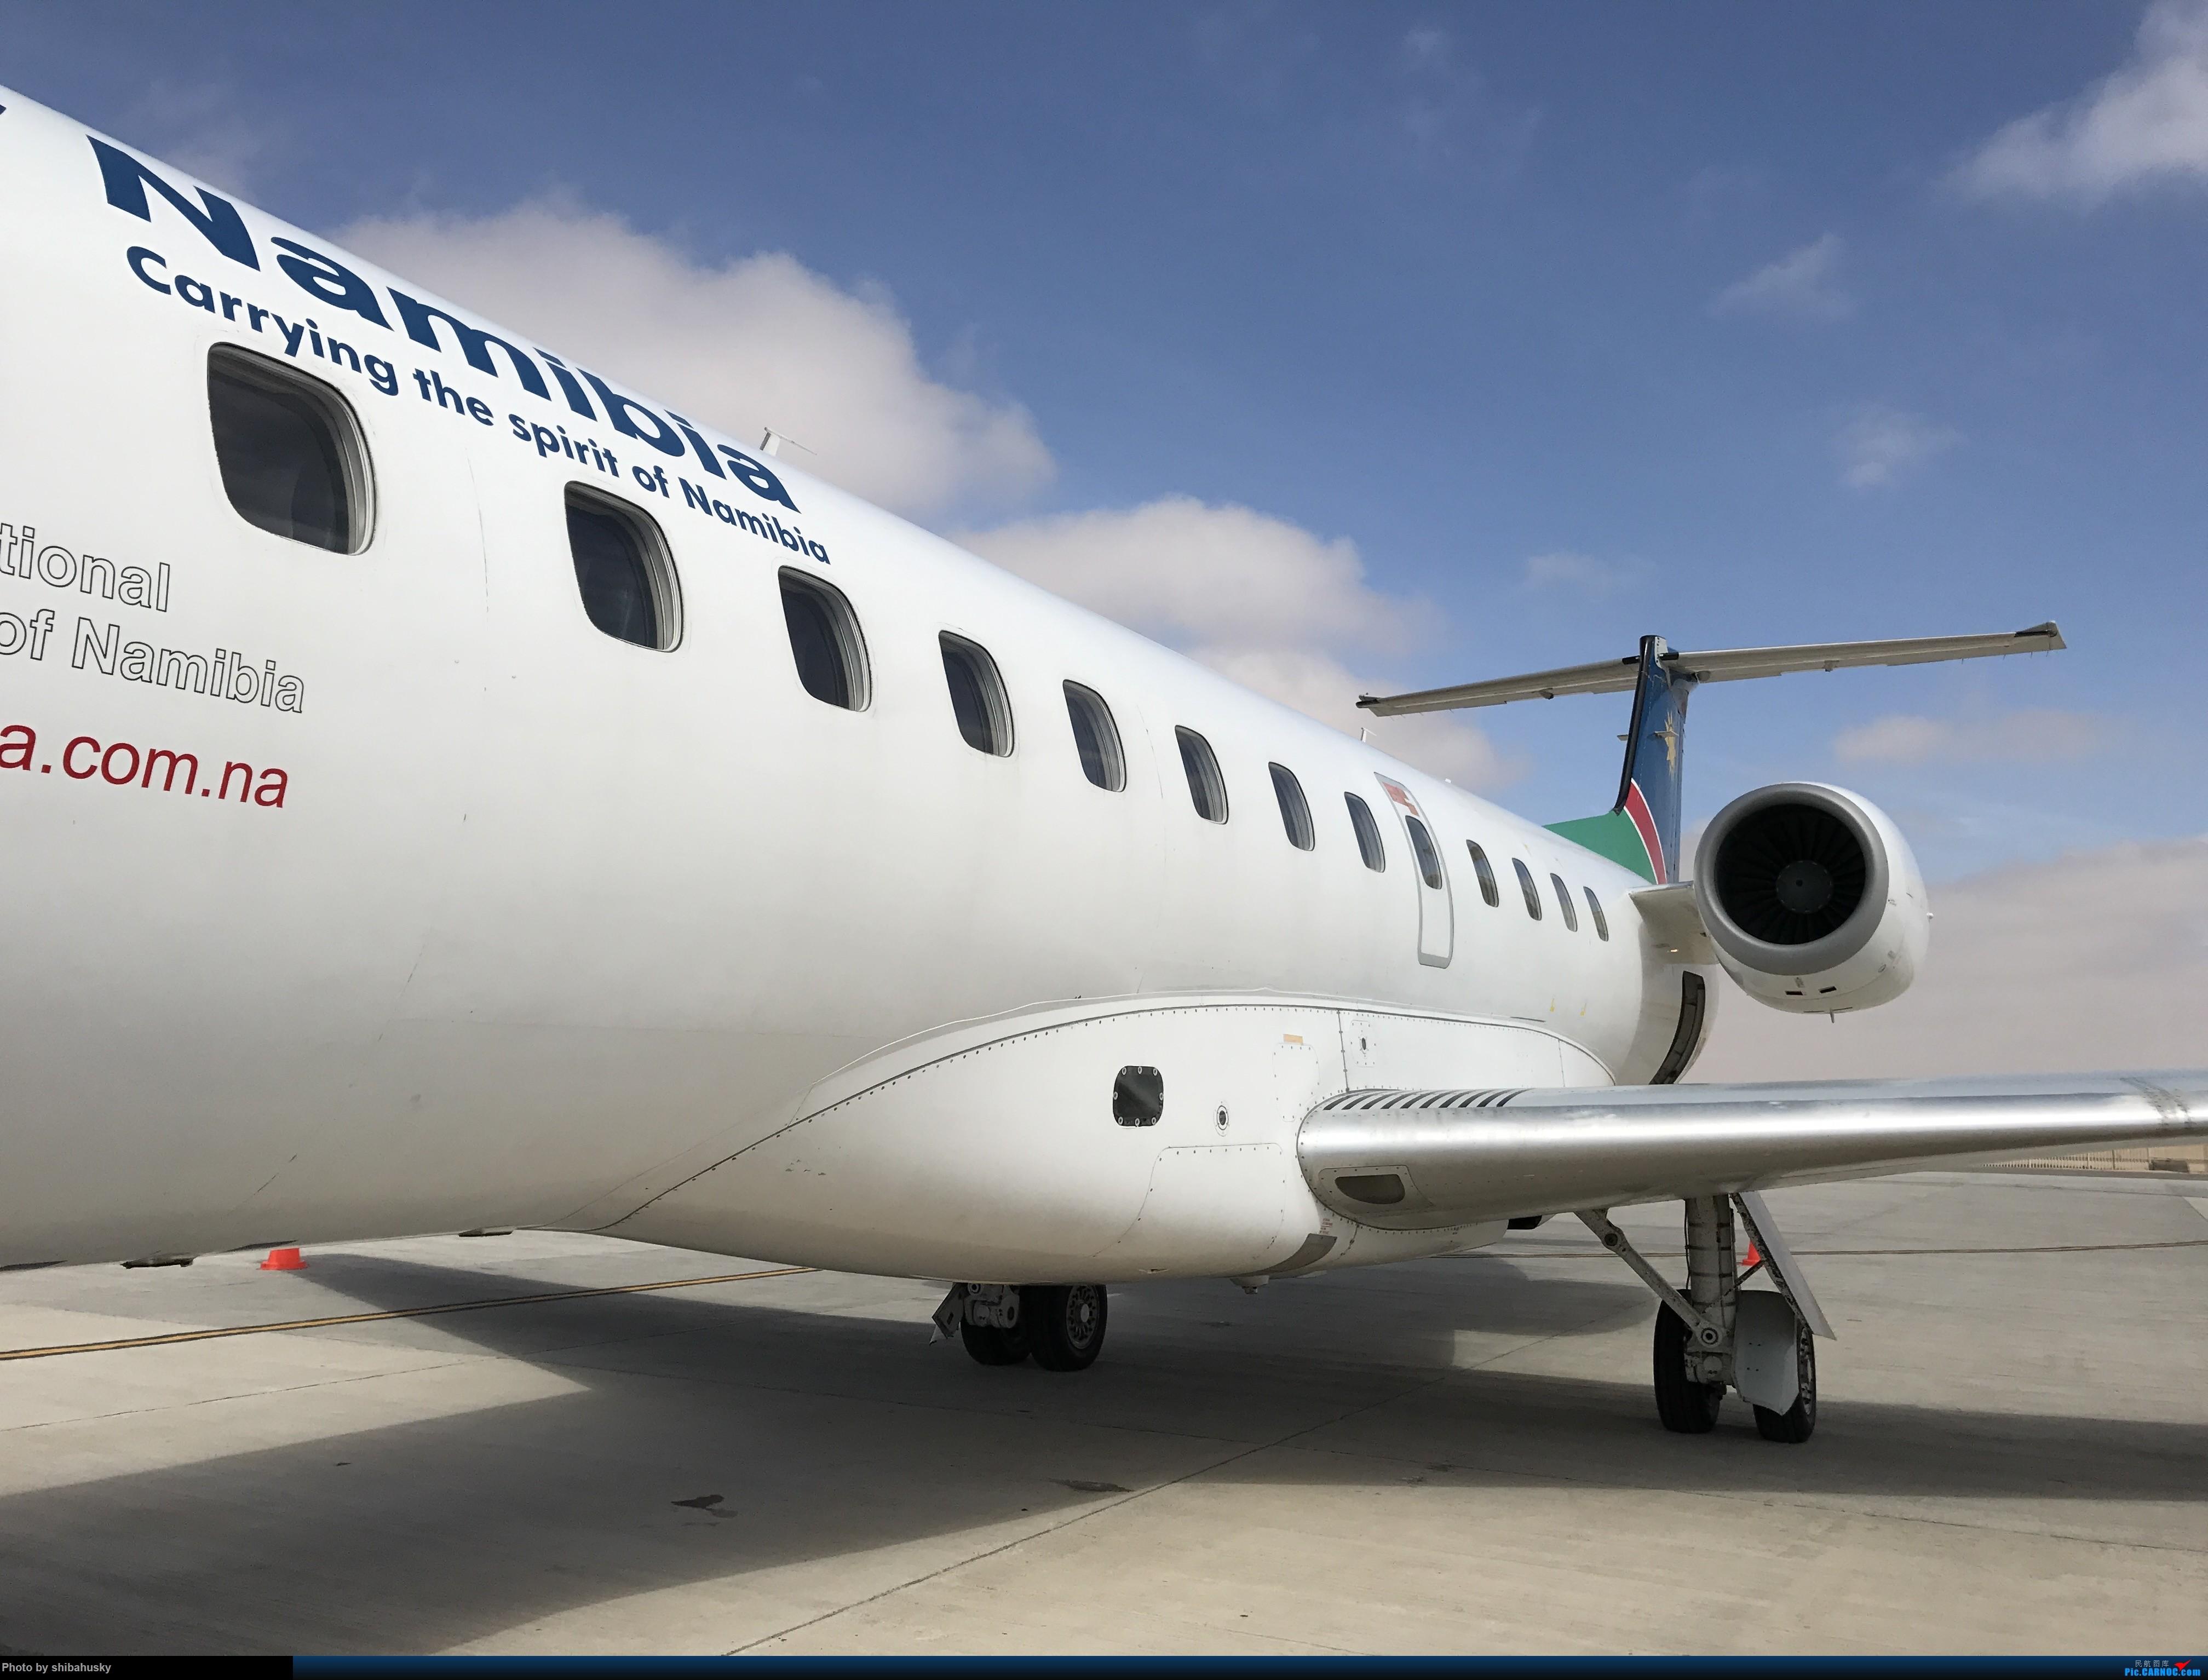 Re:[原创]新人第一帖 WVB-WDH-DOH-CDG-SOU 圣诞纳米比亚游记 体验稀有机型加辗转回英 EMBRAER ERJ-135 V5-ANI 鲸湾国际机场